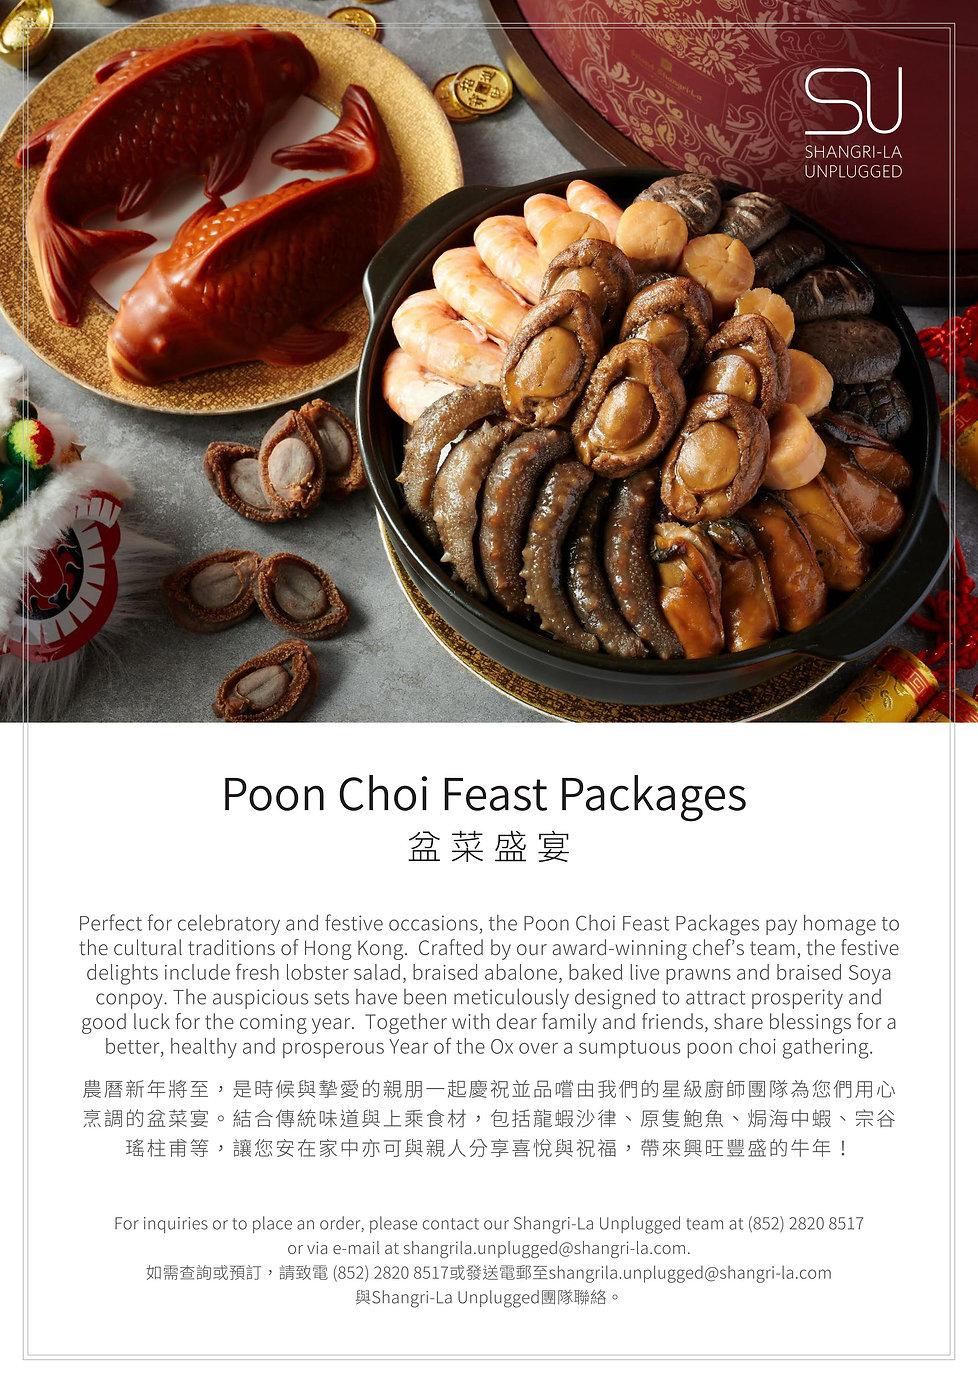 Poon Choi